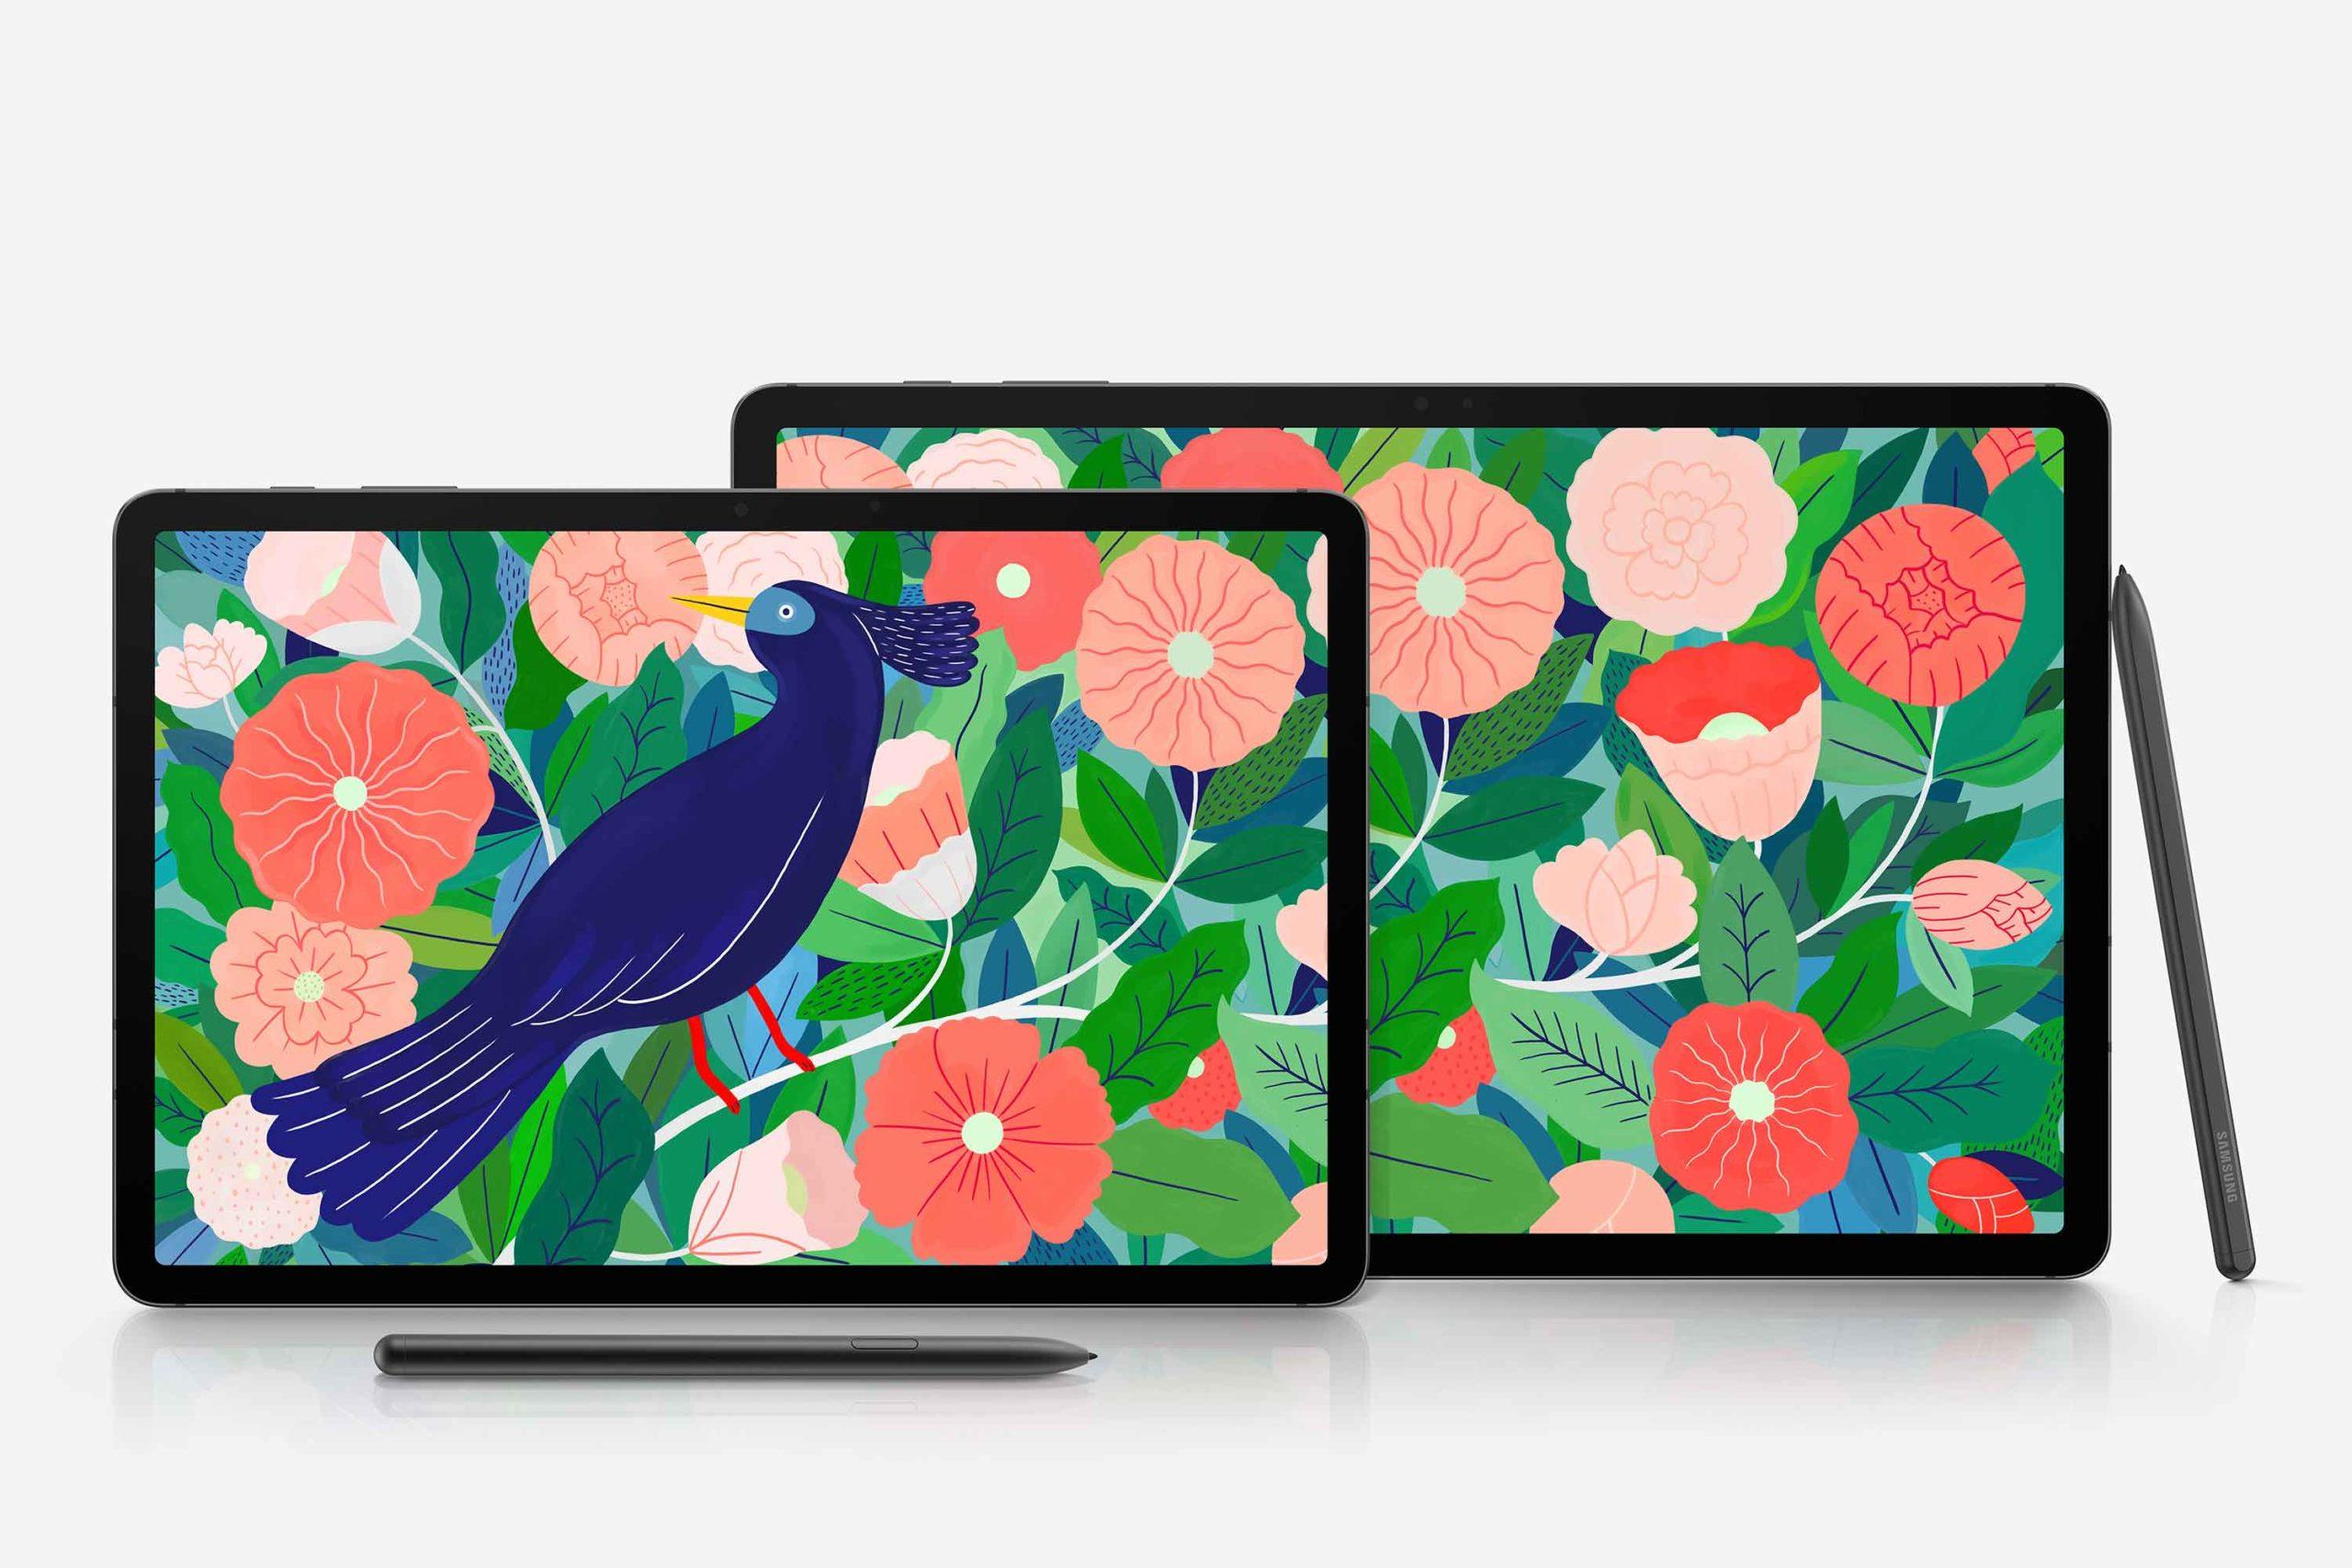 The iPad Pro Killer Is Here! Samsung Galaxy Tab S7 Series ...